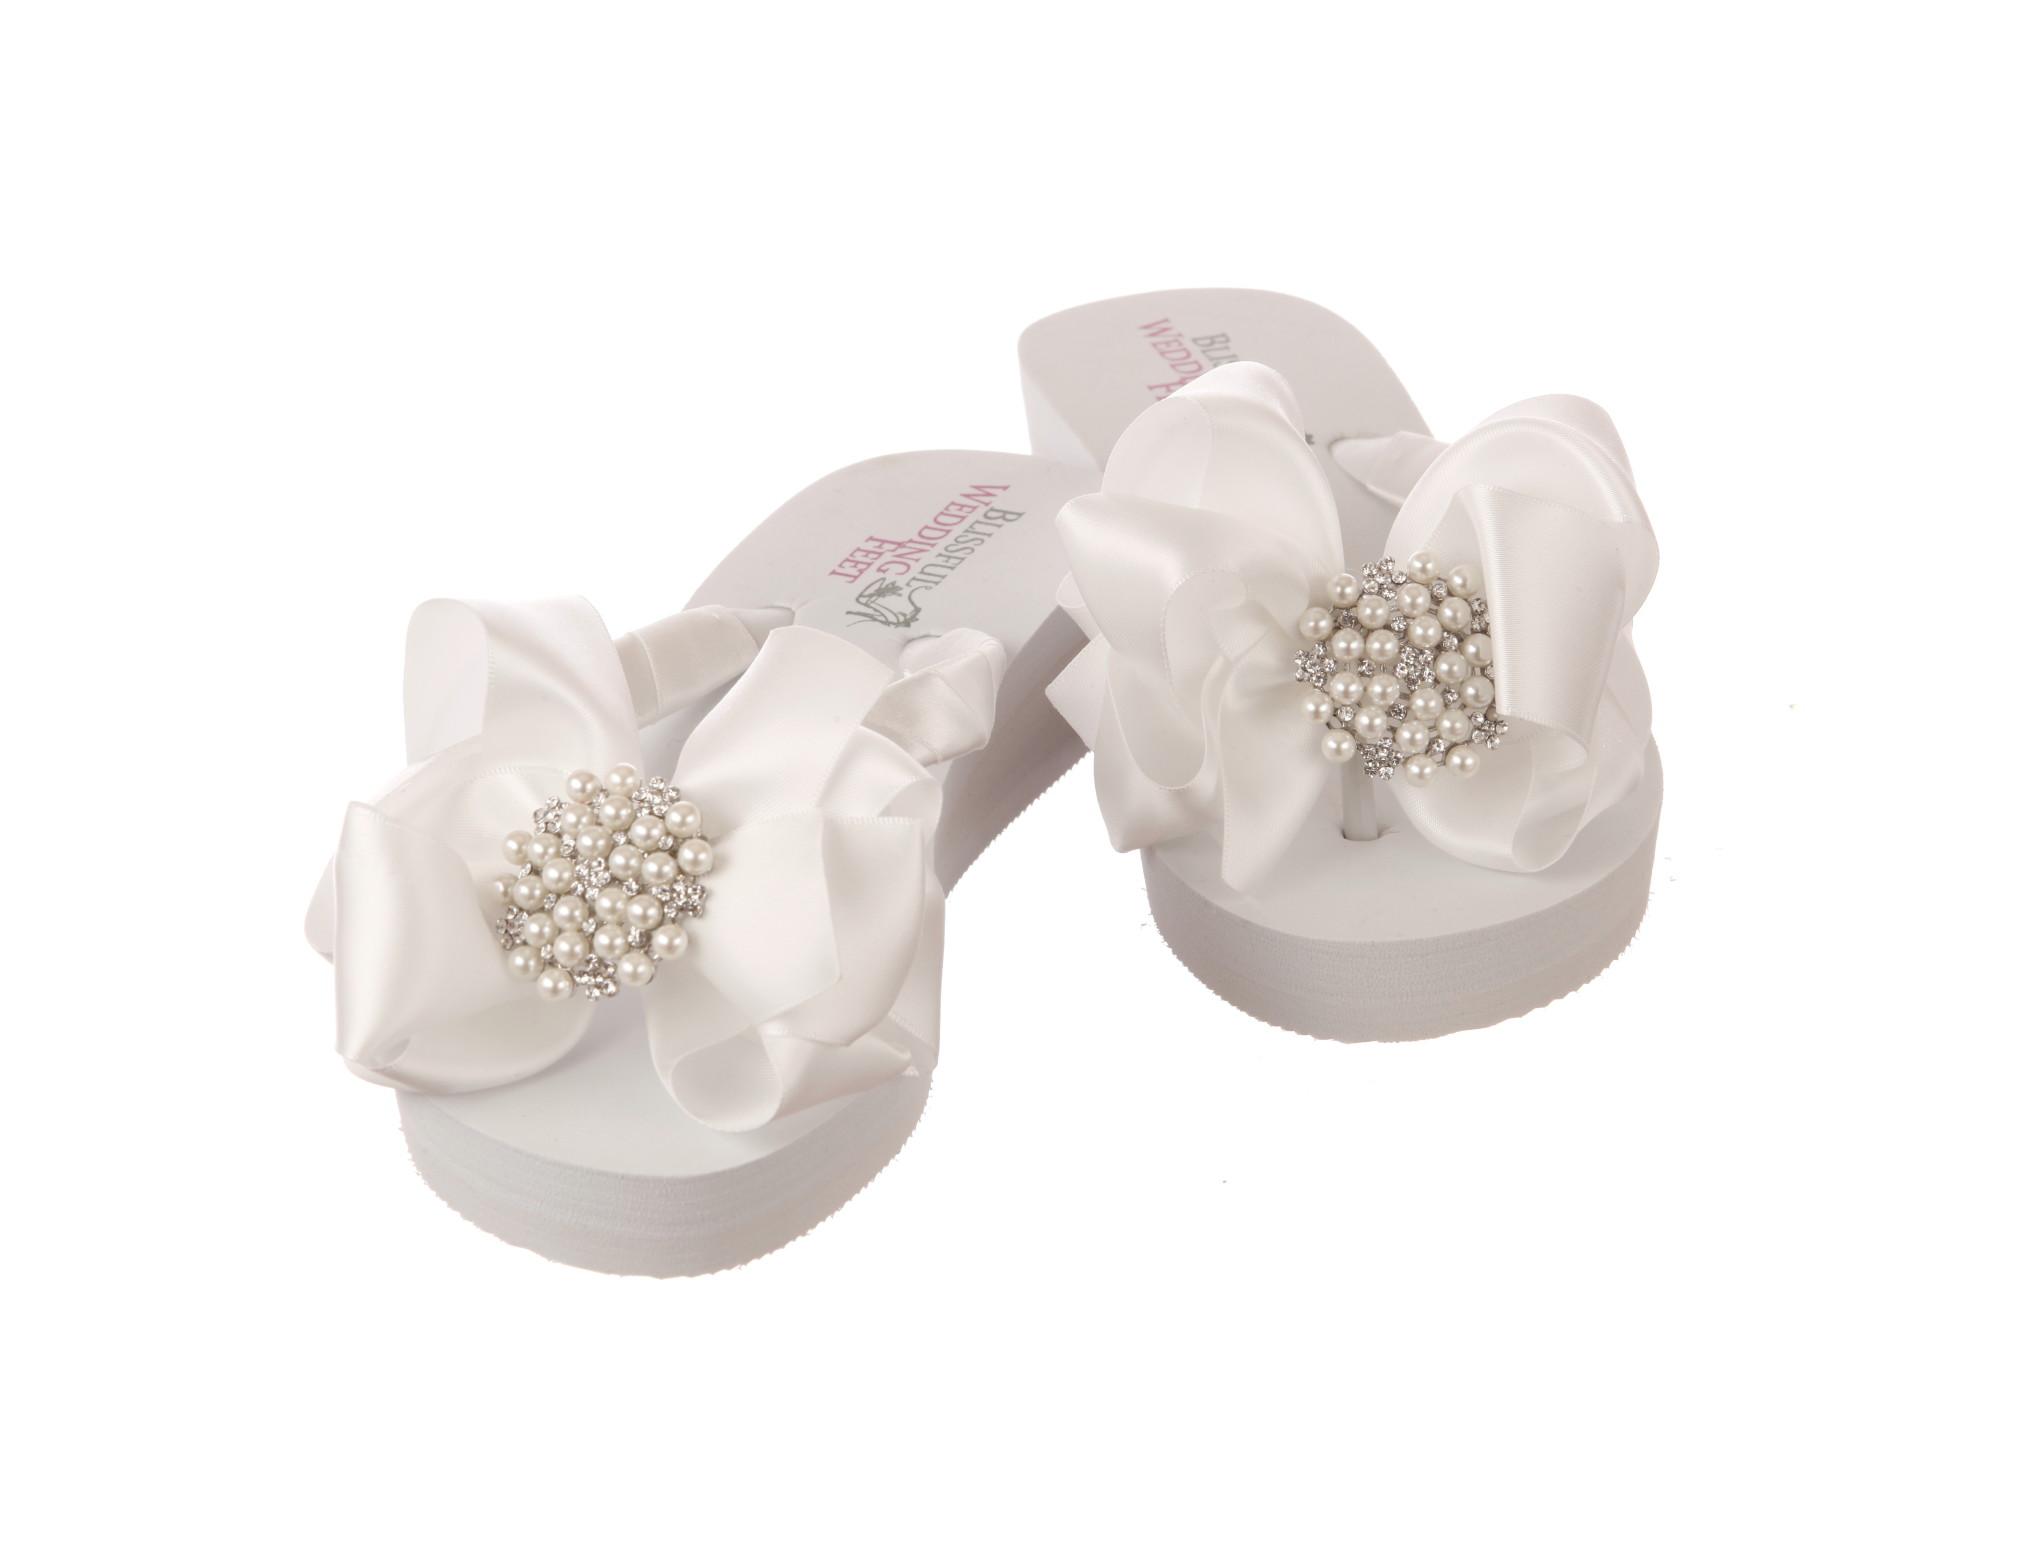 ed378e035c90 Bridal Flip Flops for your Wedding